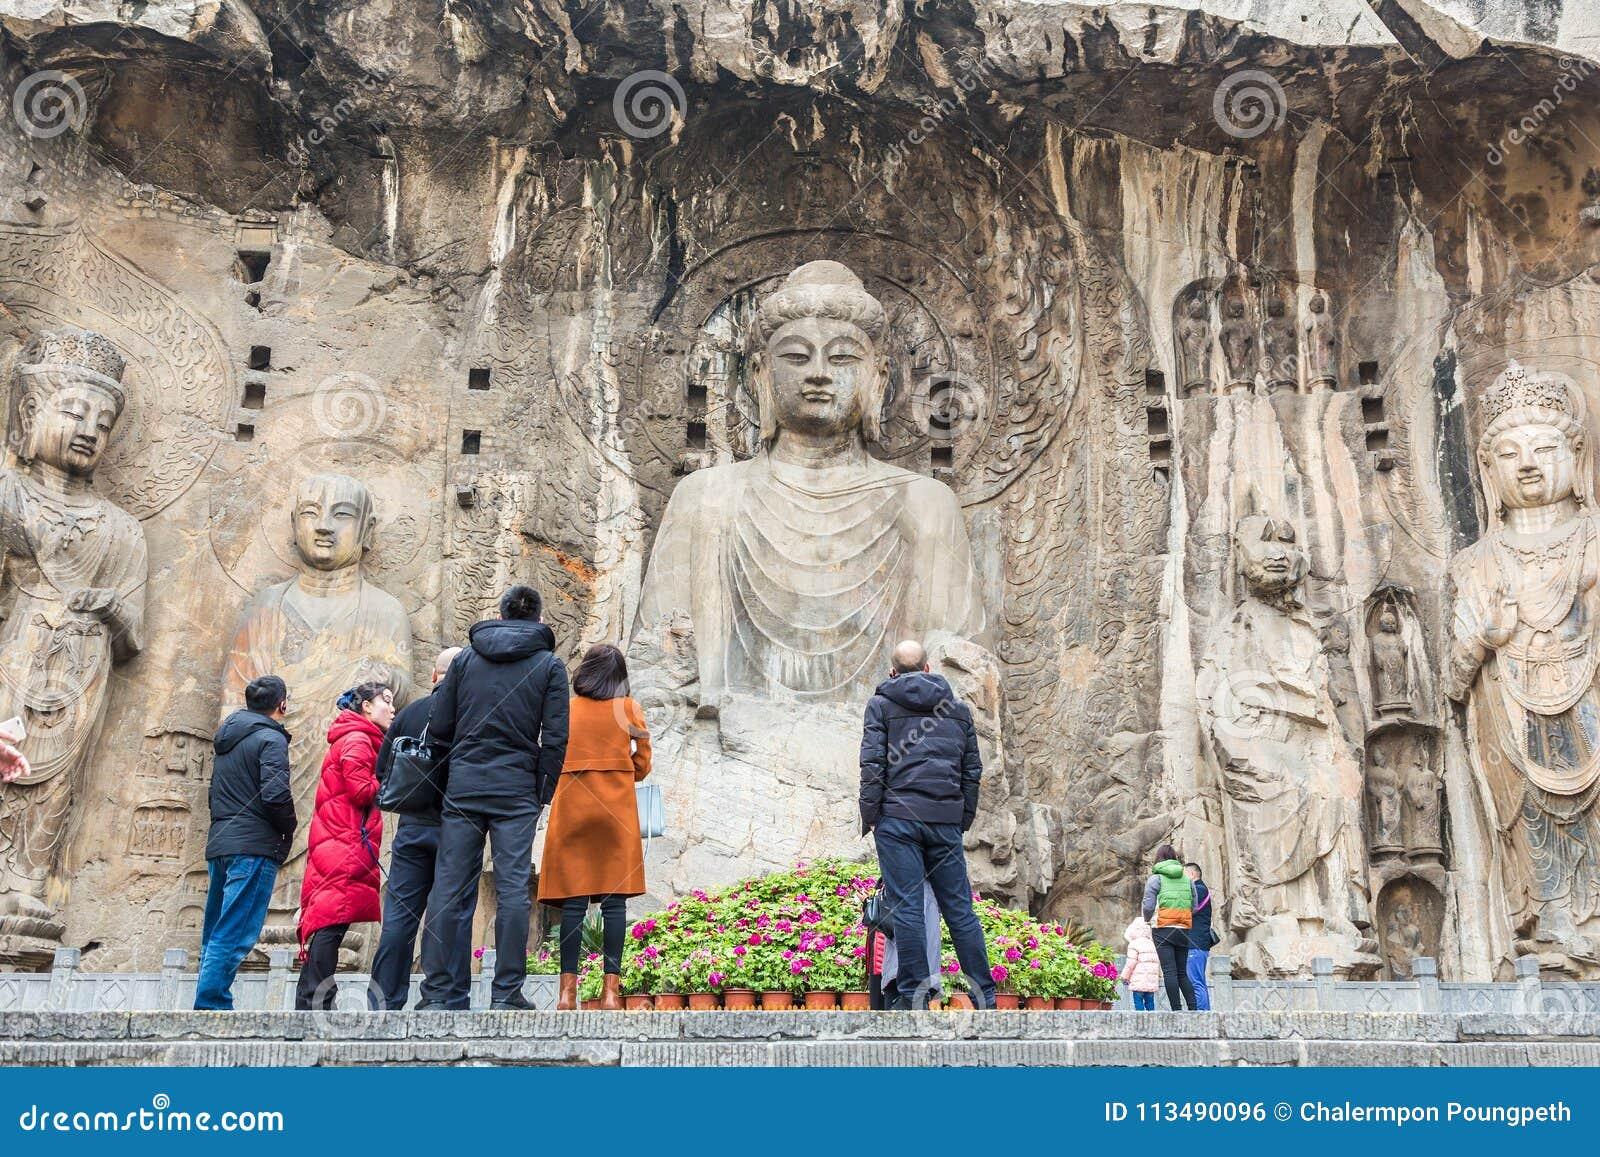 The Longmen Grottoes or Longmen Caves, famous tourist destination on Luoyang, China